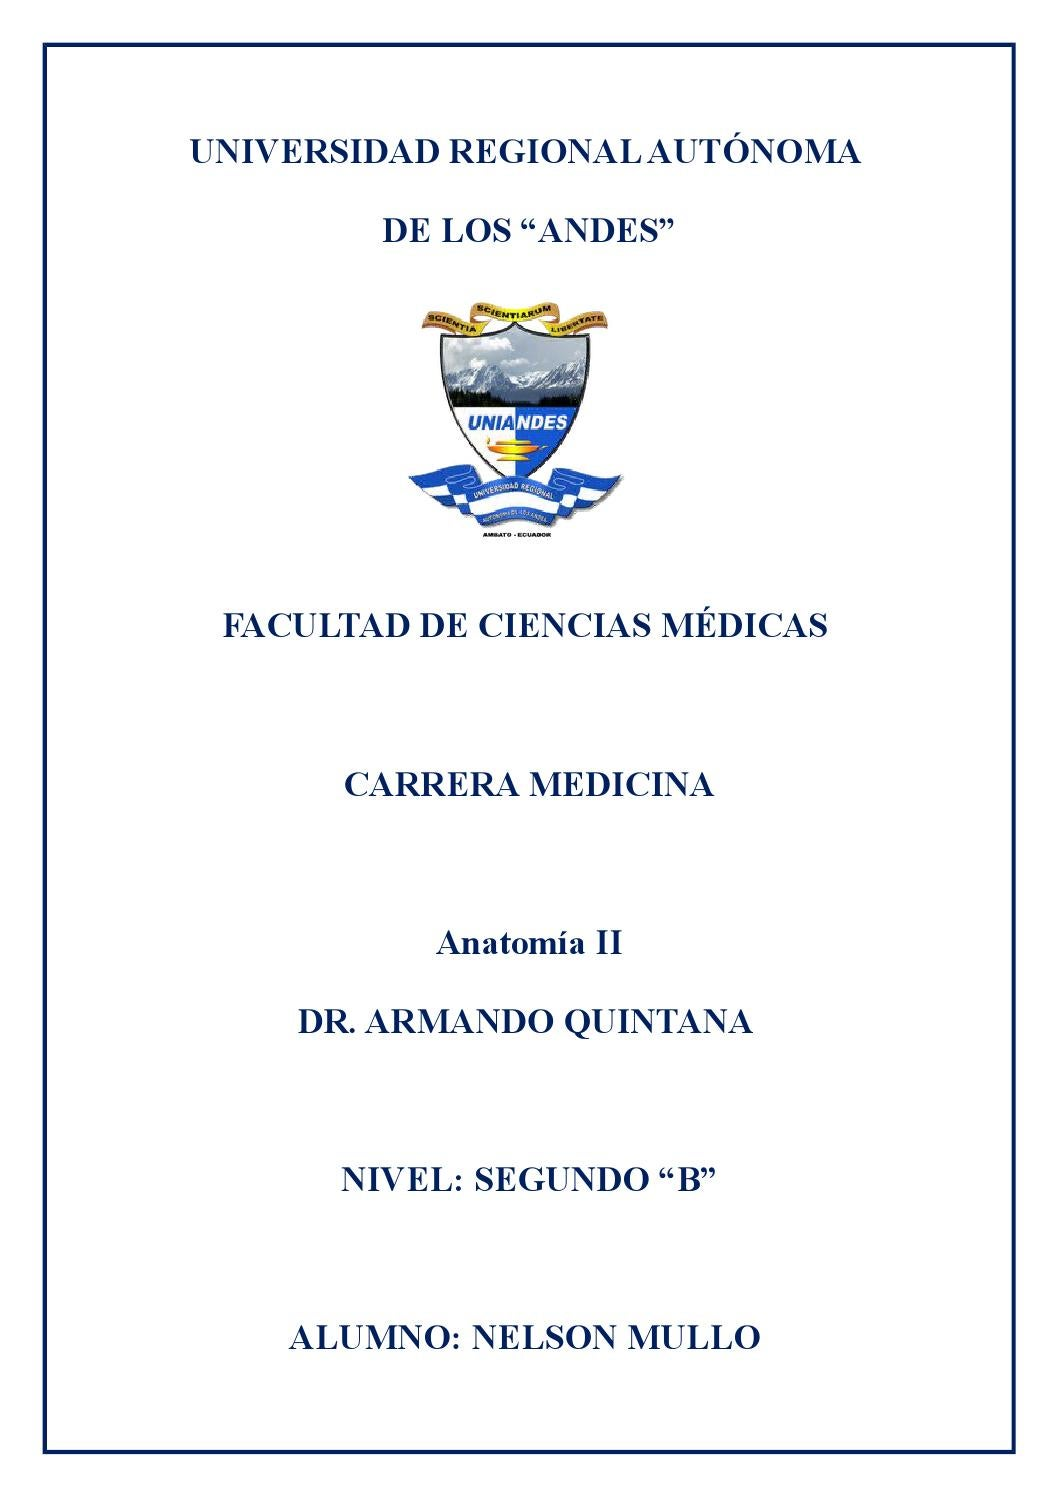 Glosario de término Anatomía II by Nêlsïtõn Mullo - issuu